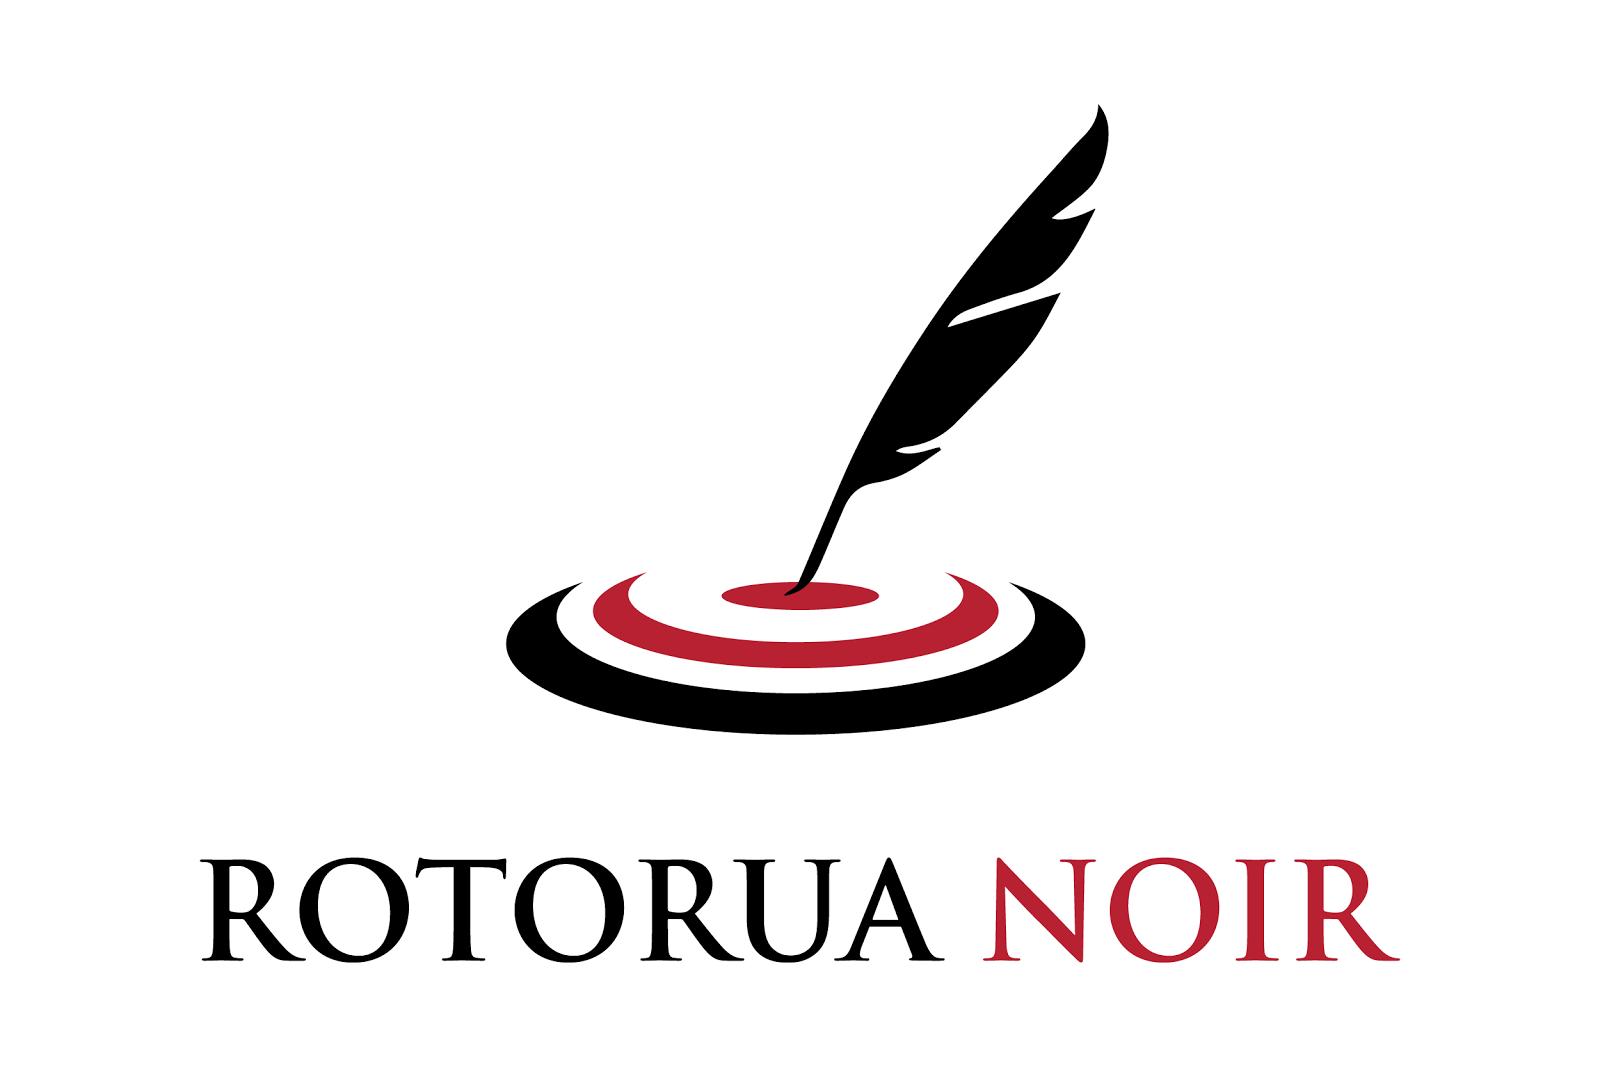 Rotorua Noir 2019